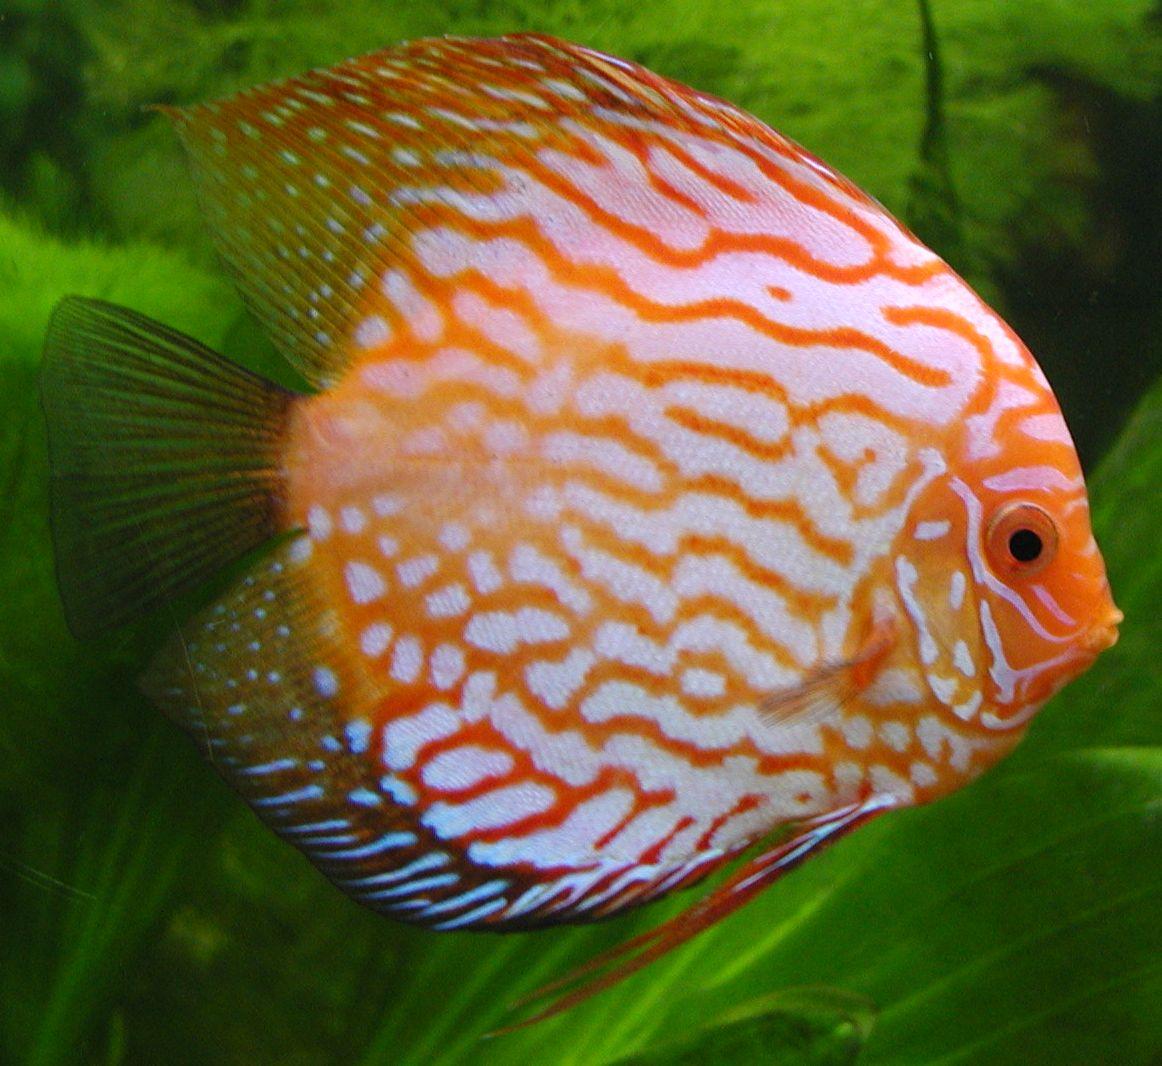 Fish aquarium in jayanagar - Iit Jee Center Of Mass Skmclasses Bangalore Subhashish Sir Skm Classes Bangalore